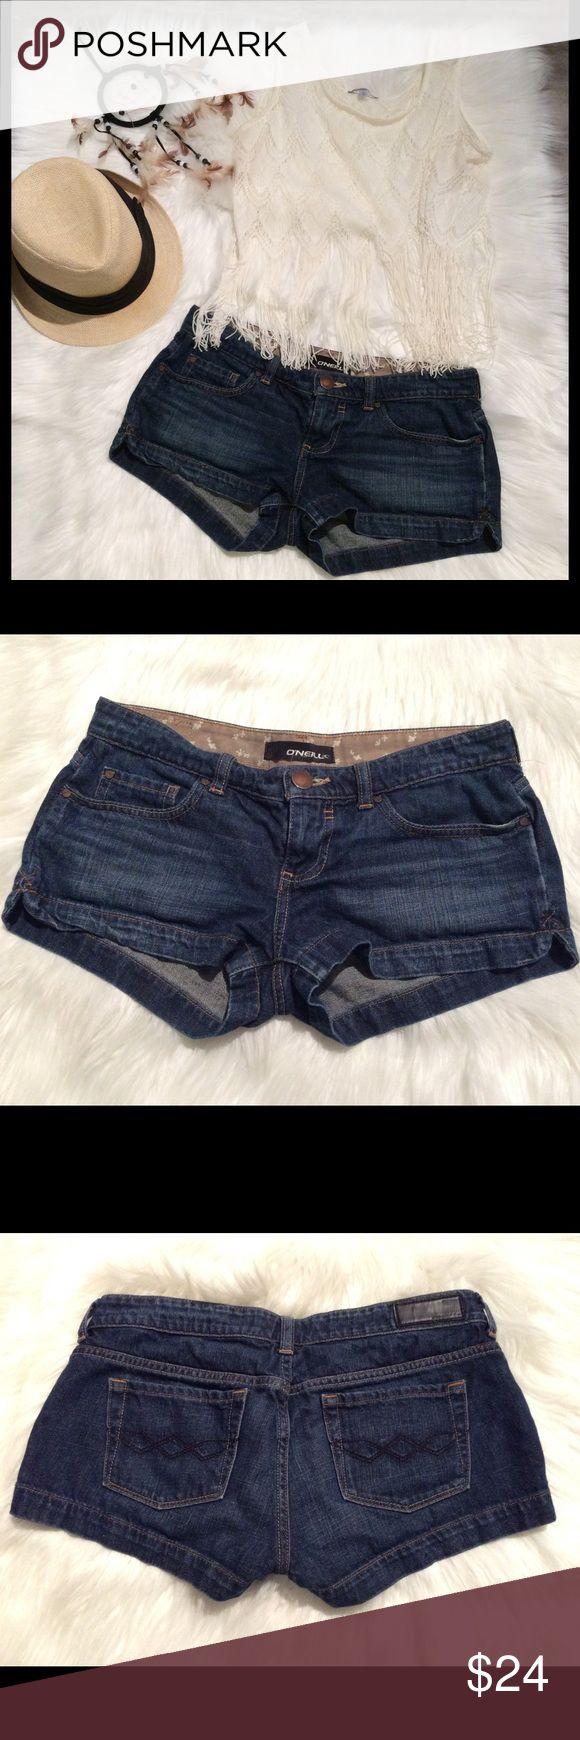 O'Neil Jean Shorts 🏄🏼 O'Neil ladies Jean shorts size 7 O'Neill Shorts Jean Shorts